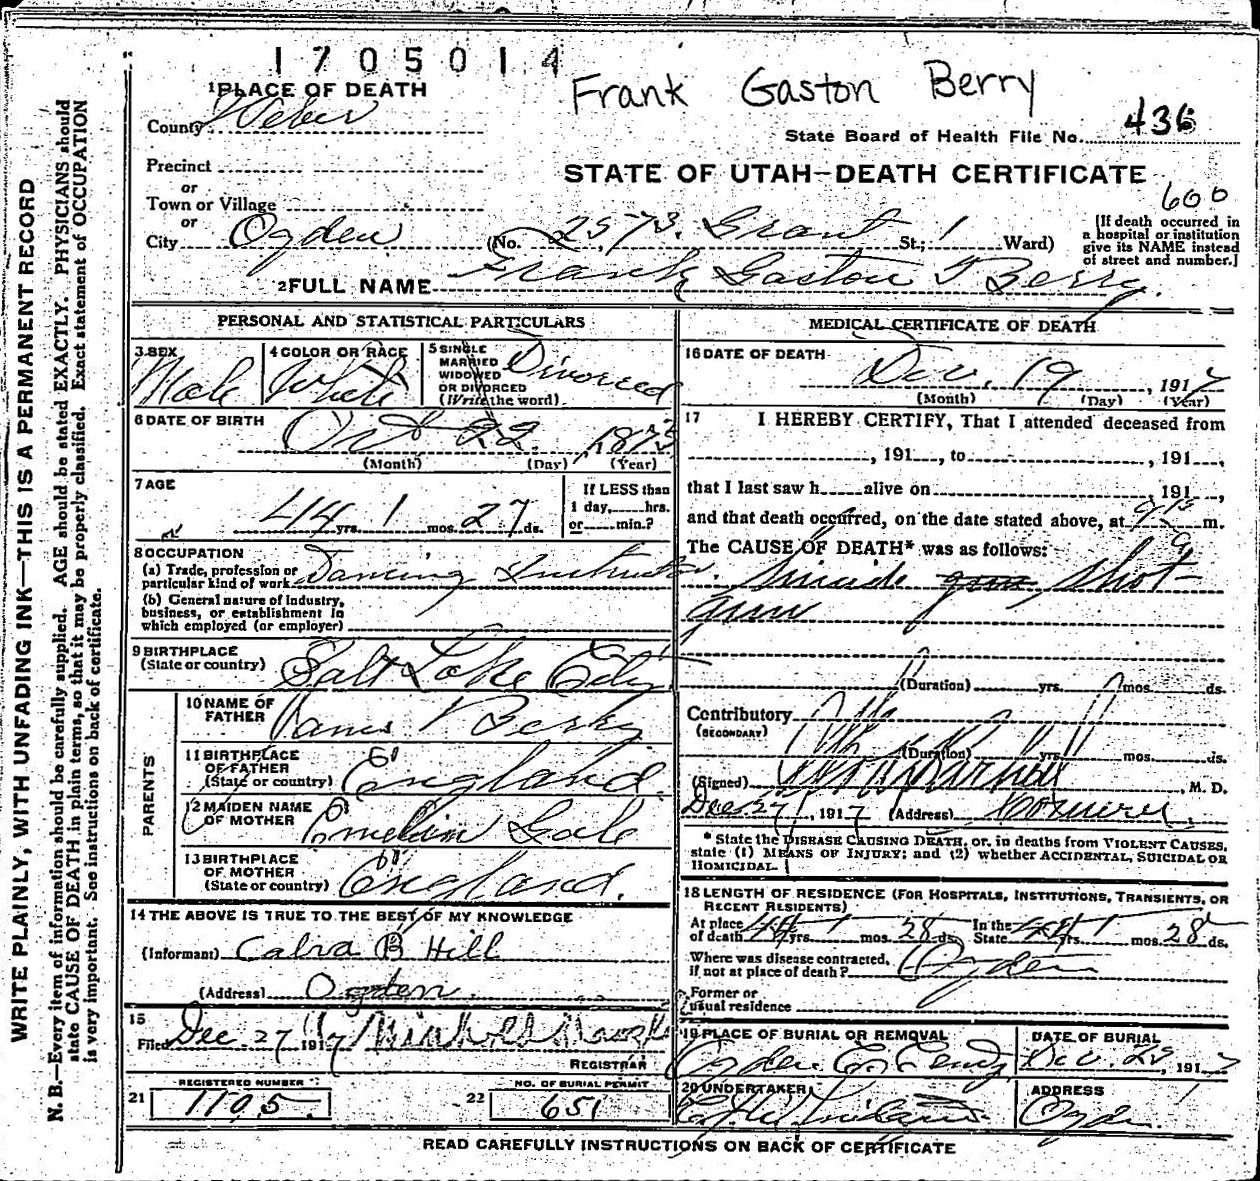 Francis Gaskin Frank Berry